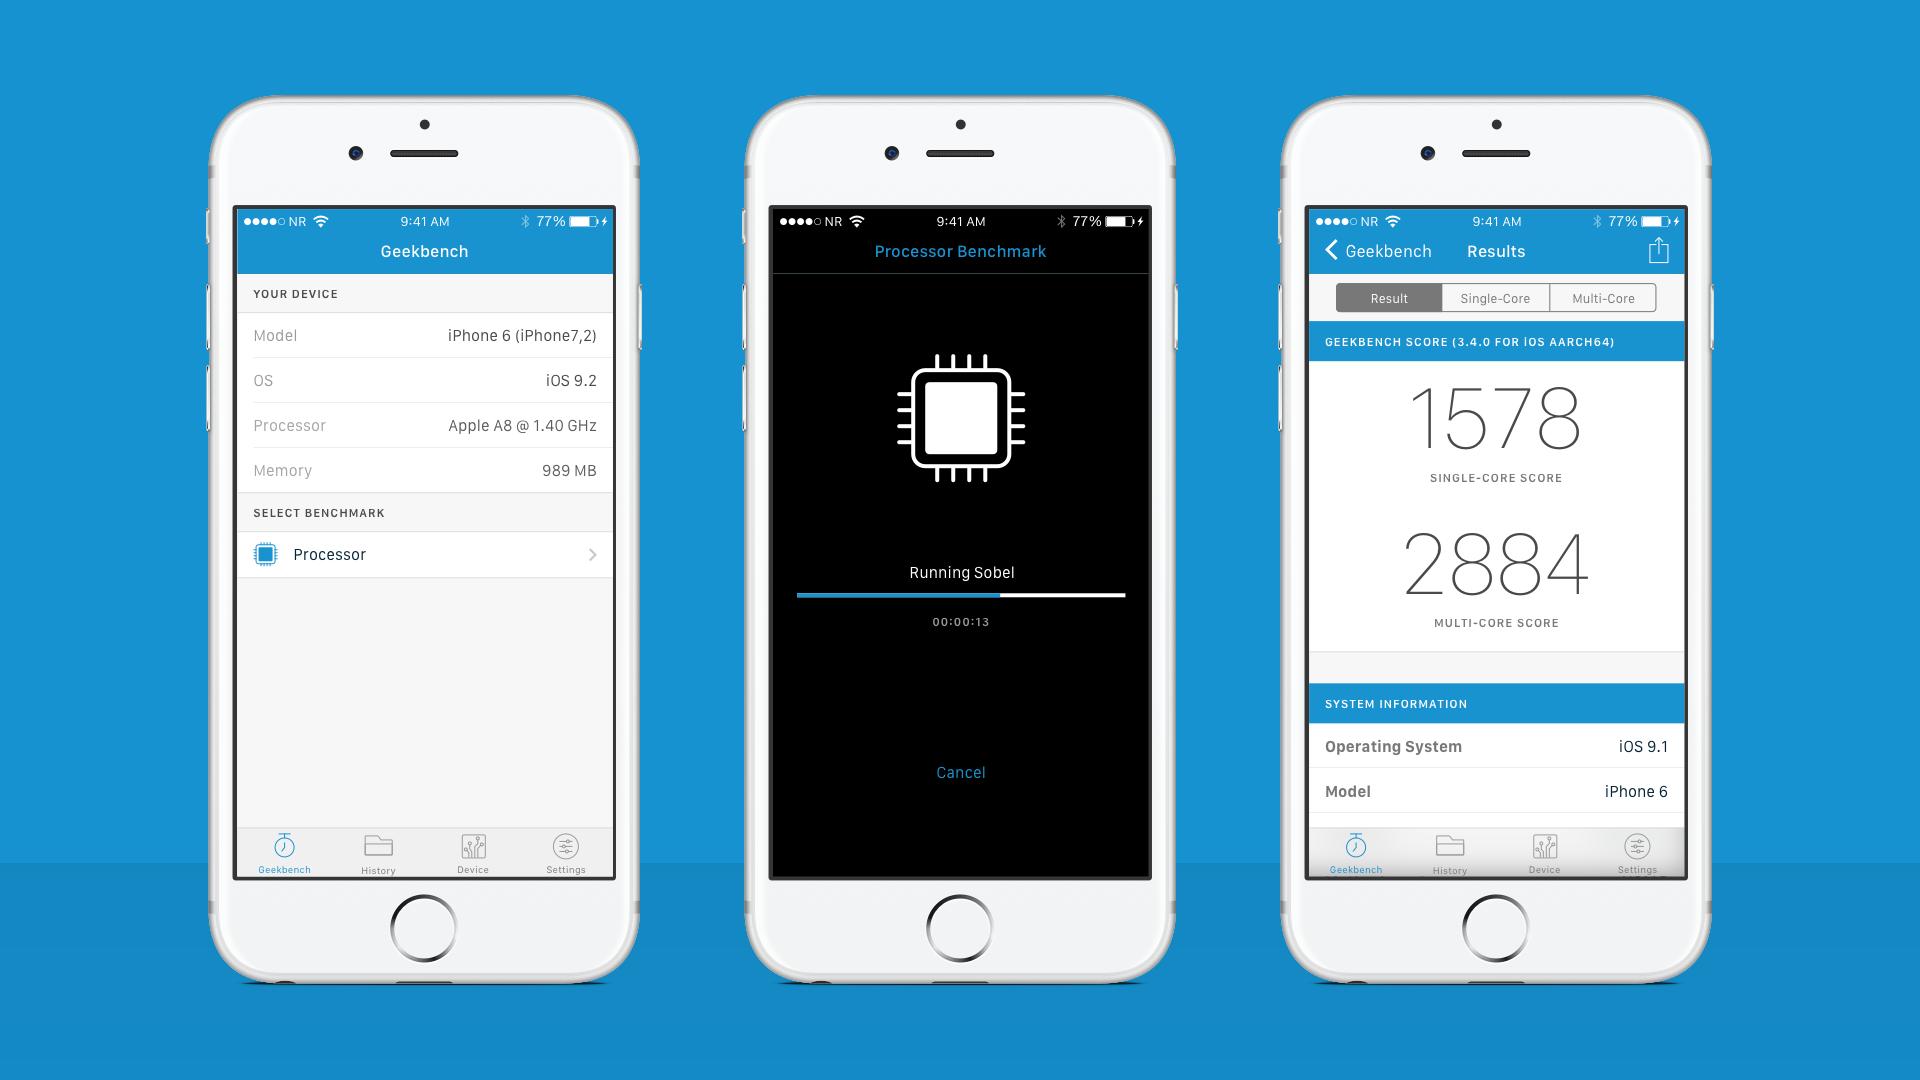 Geekbench 4: iPhone App